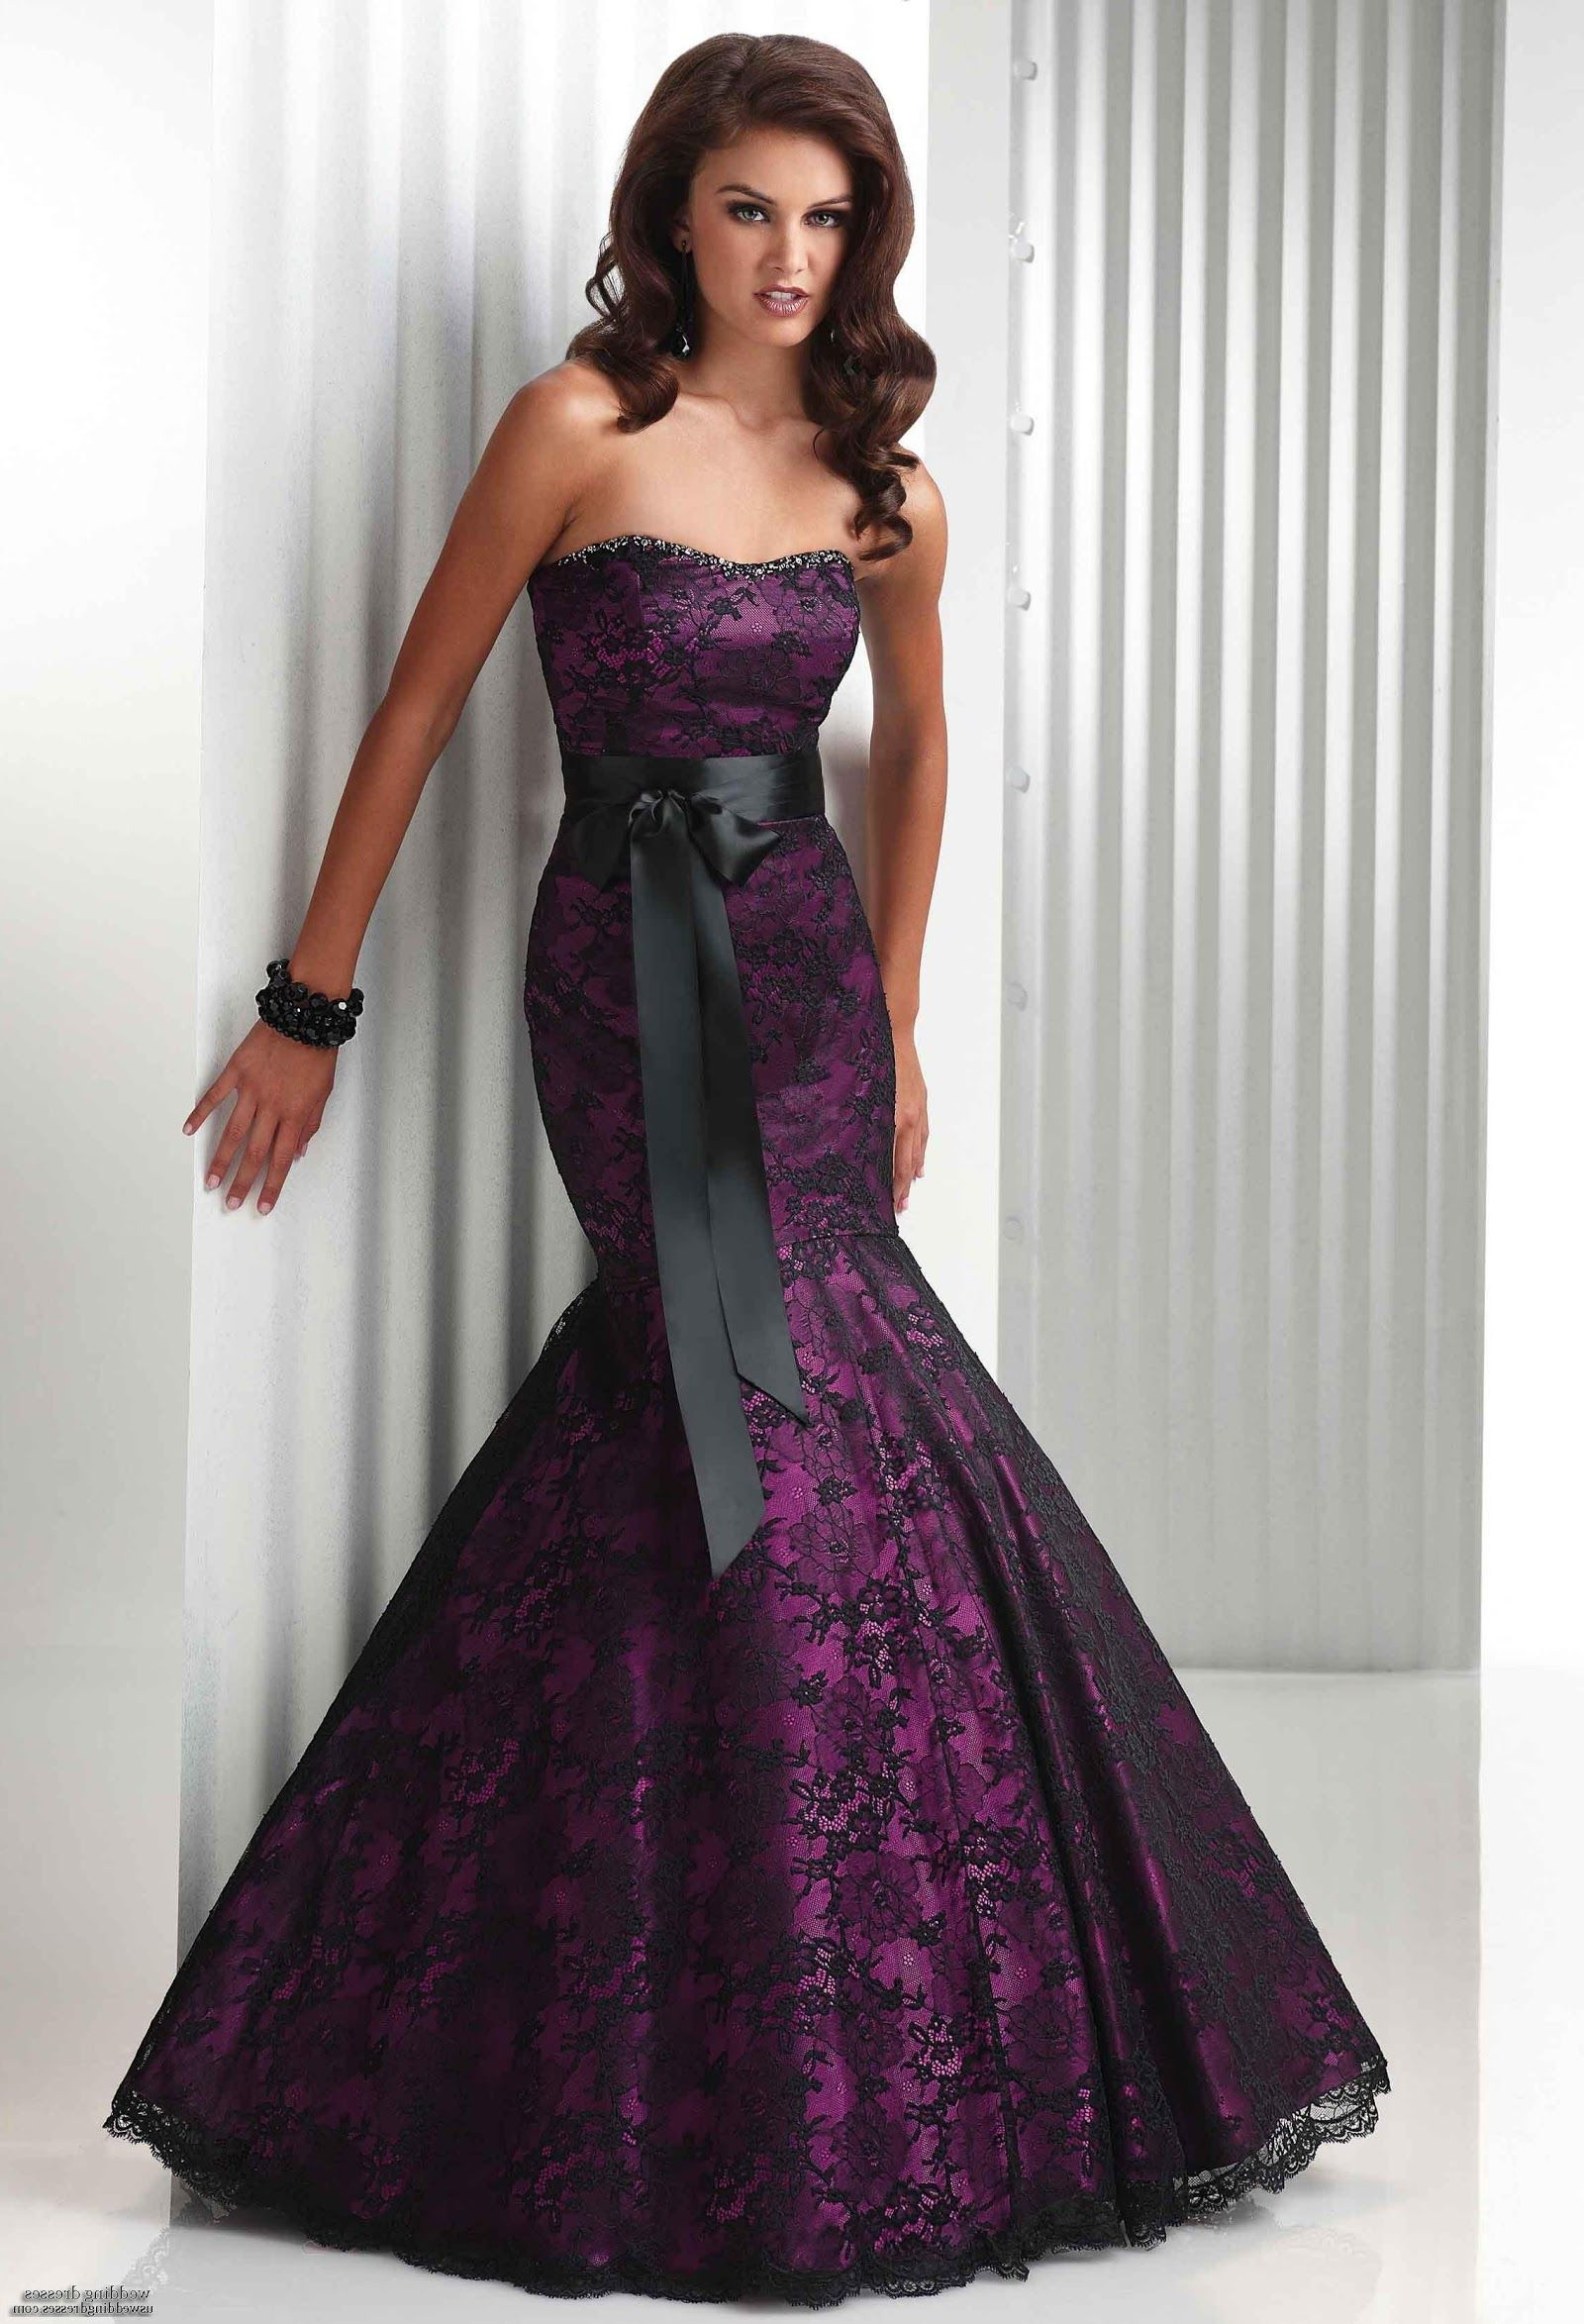 black_gothic_wedding_dresses.jpg 1,600×2,347 pixels | ❤️Getting ...